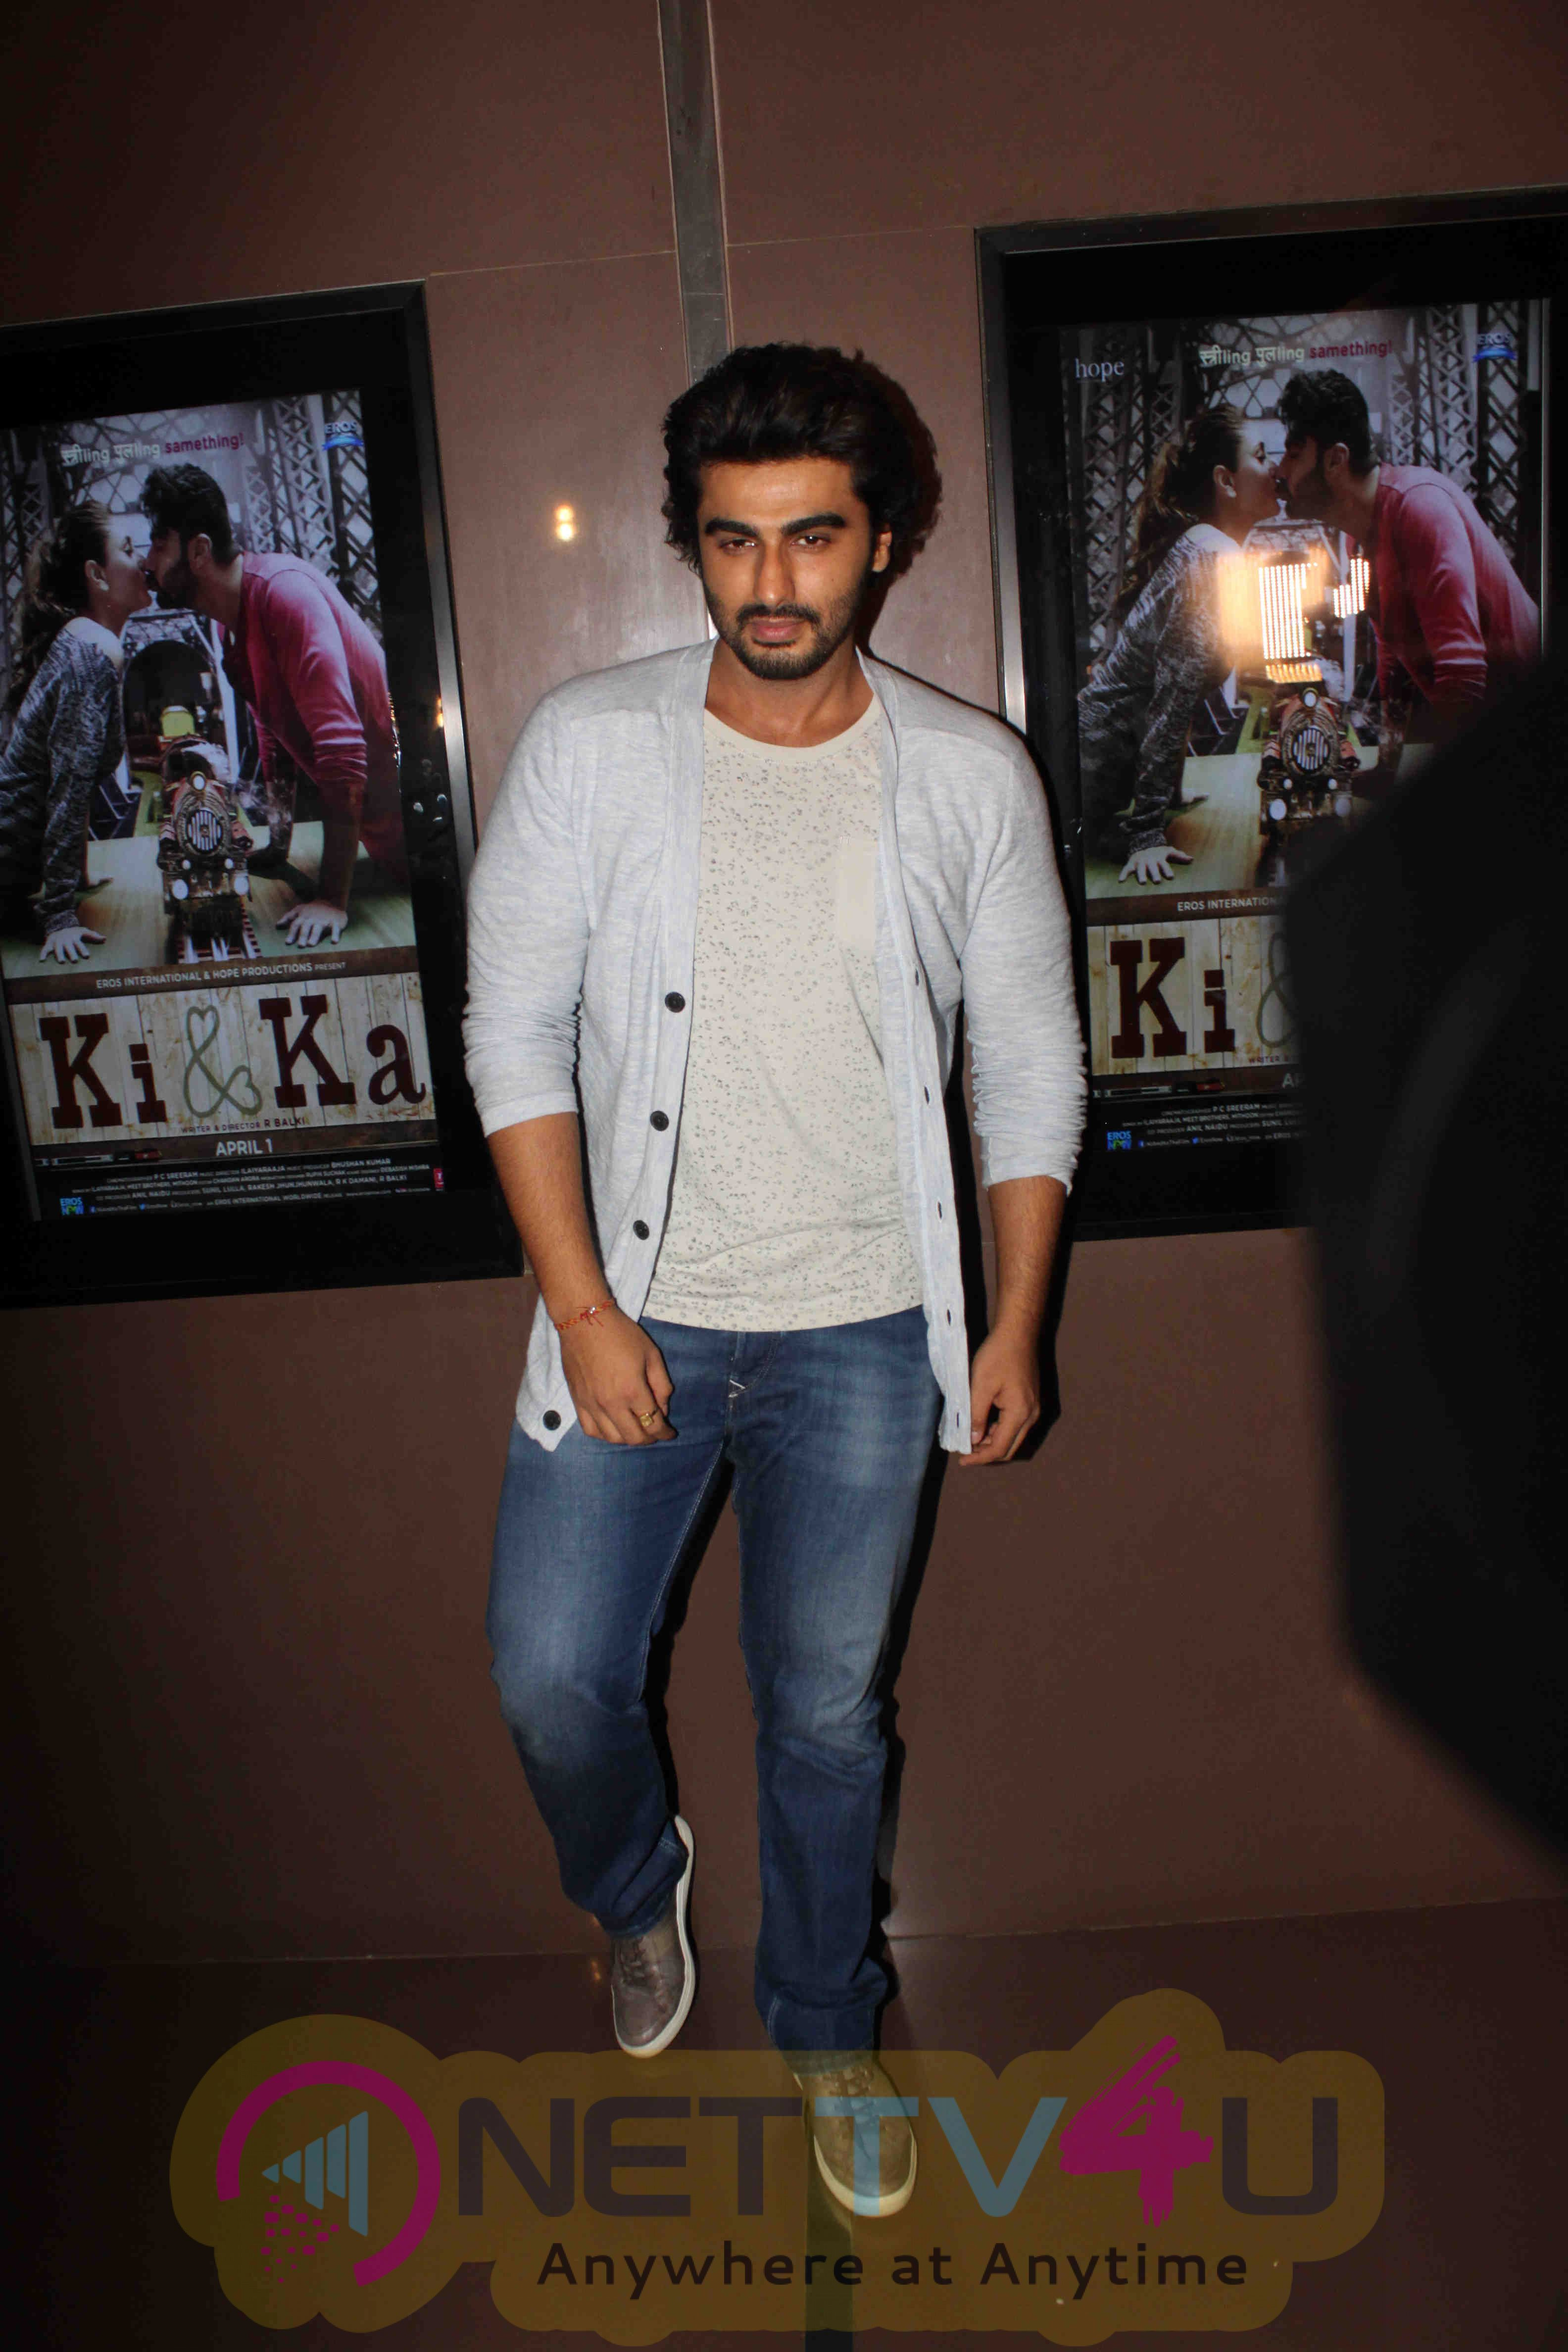 Photos Of ActorArjun KapoorFeels ThatHisUpcoming RomanticFilmKiAndKa Will Work With TheAudiences